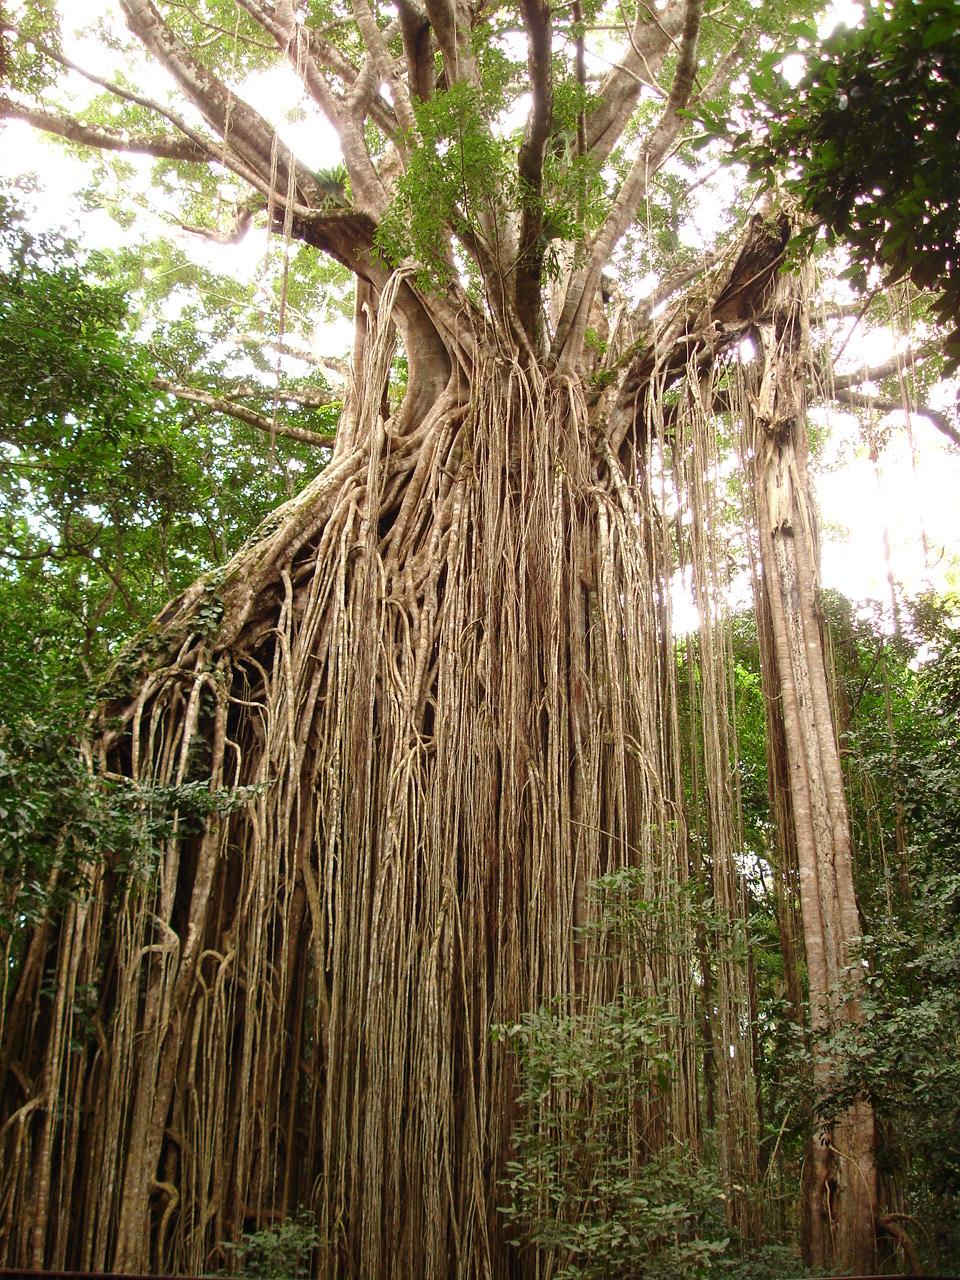 Figtree Australia  city pictures gallery : Fitxer:Curtain Fig Tree, Queensland, Australia Viquipèdia, l ...